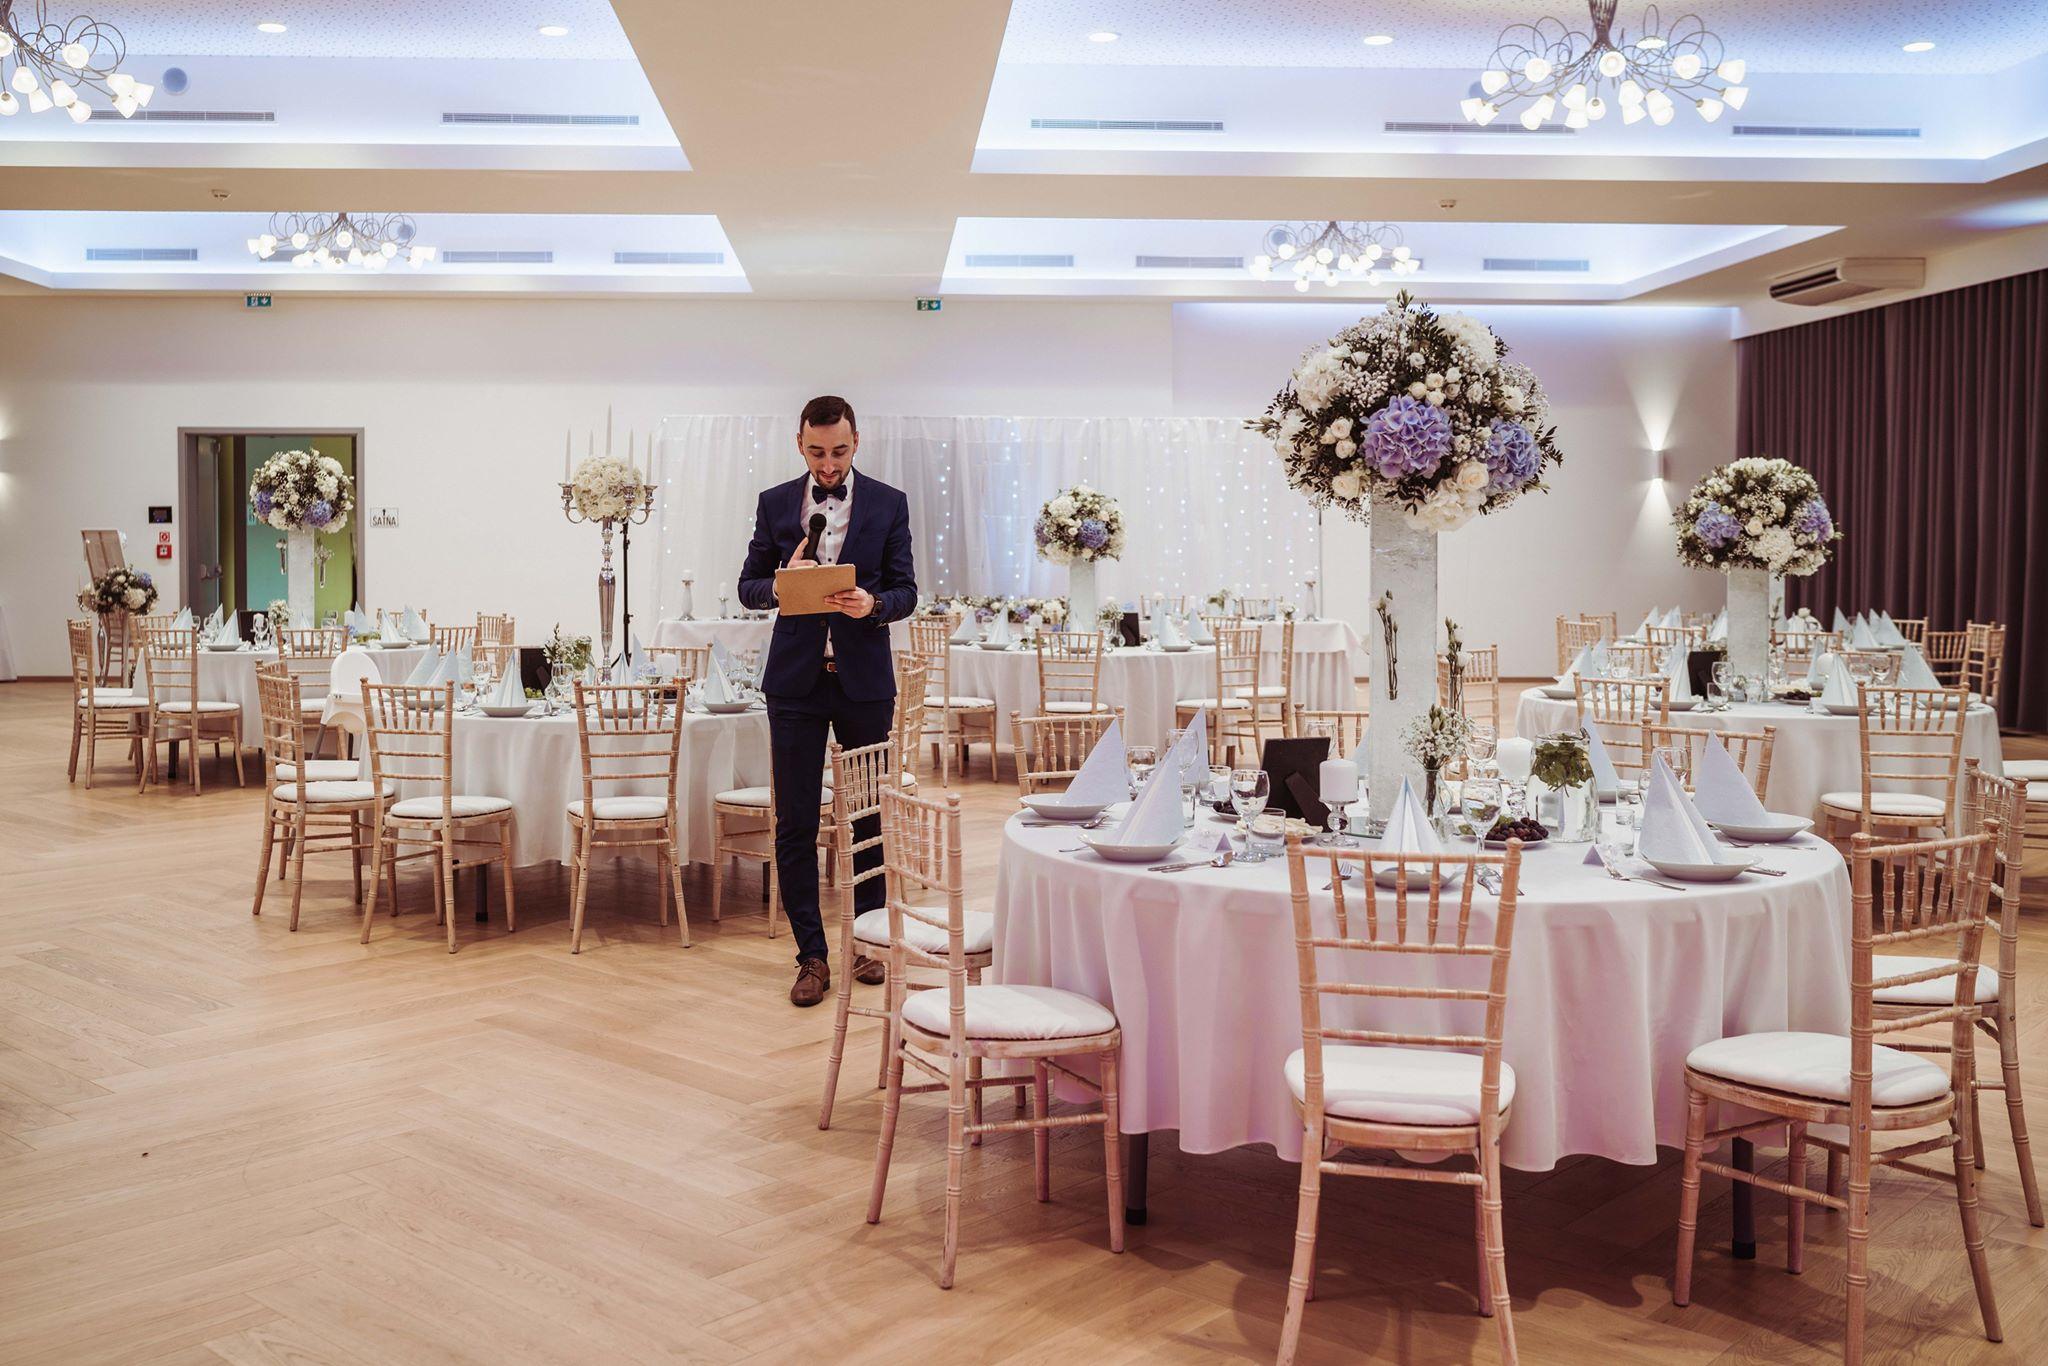 dj-starejsi-moderator-wedding-event-djmikejpg